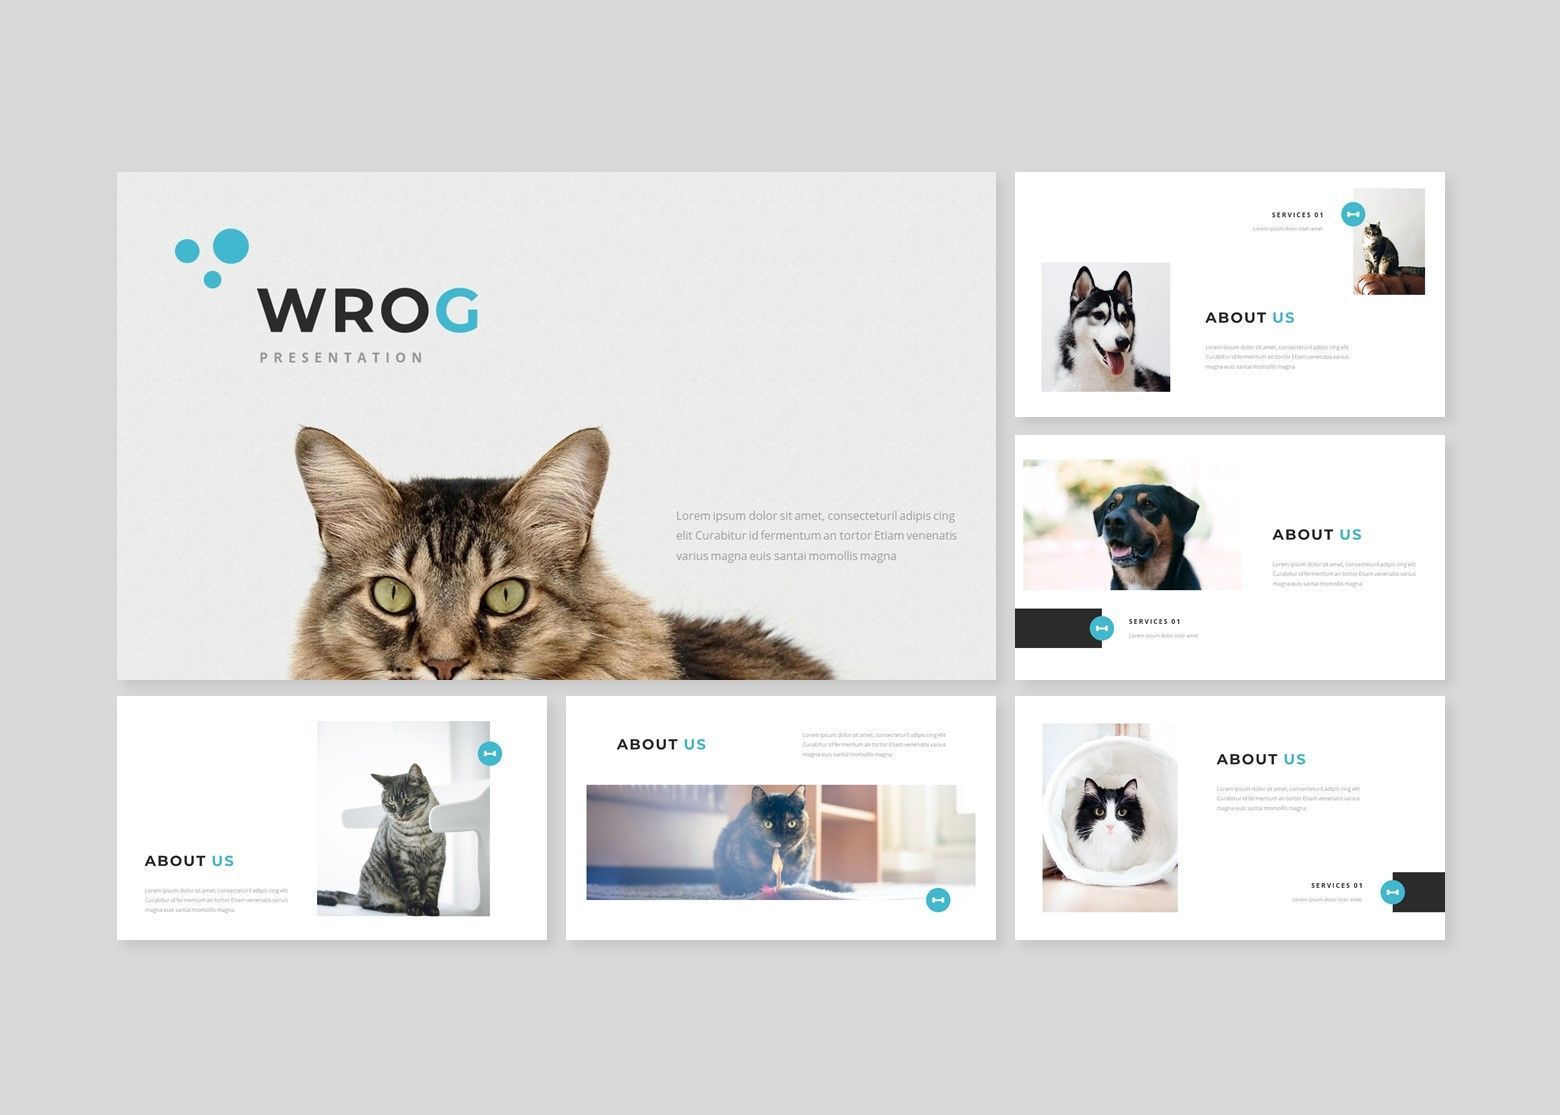 Wrog A Pet Service Keynote Presentation Template, Slide 2, 08155, Business Models — PoweredTemplate.com